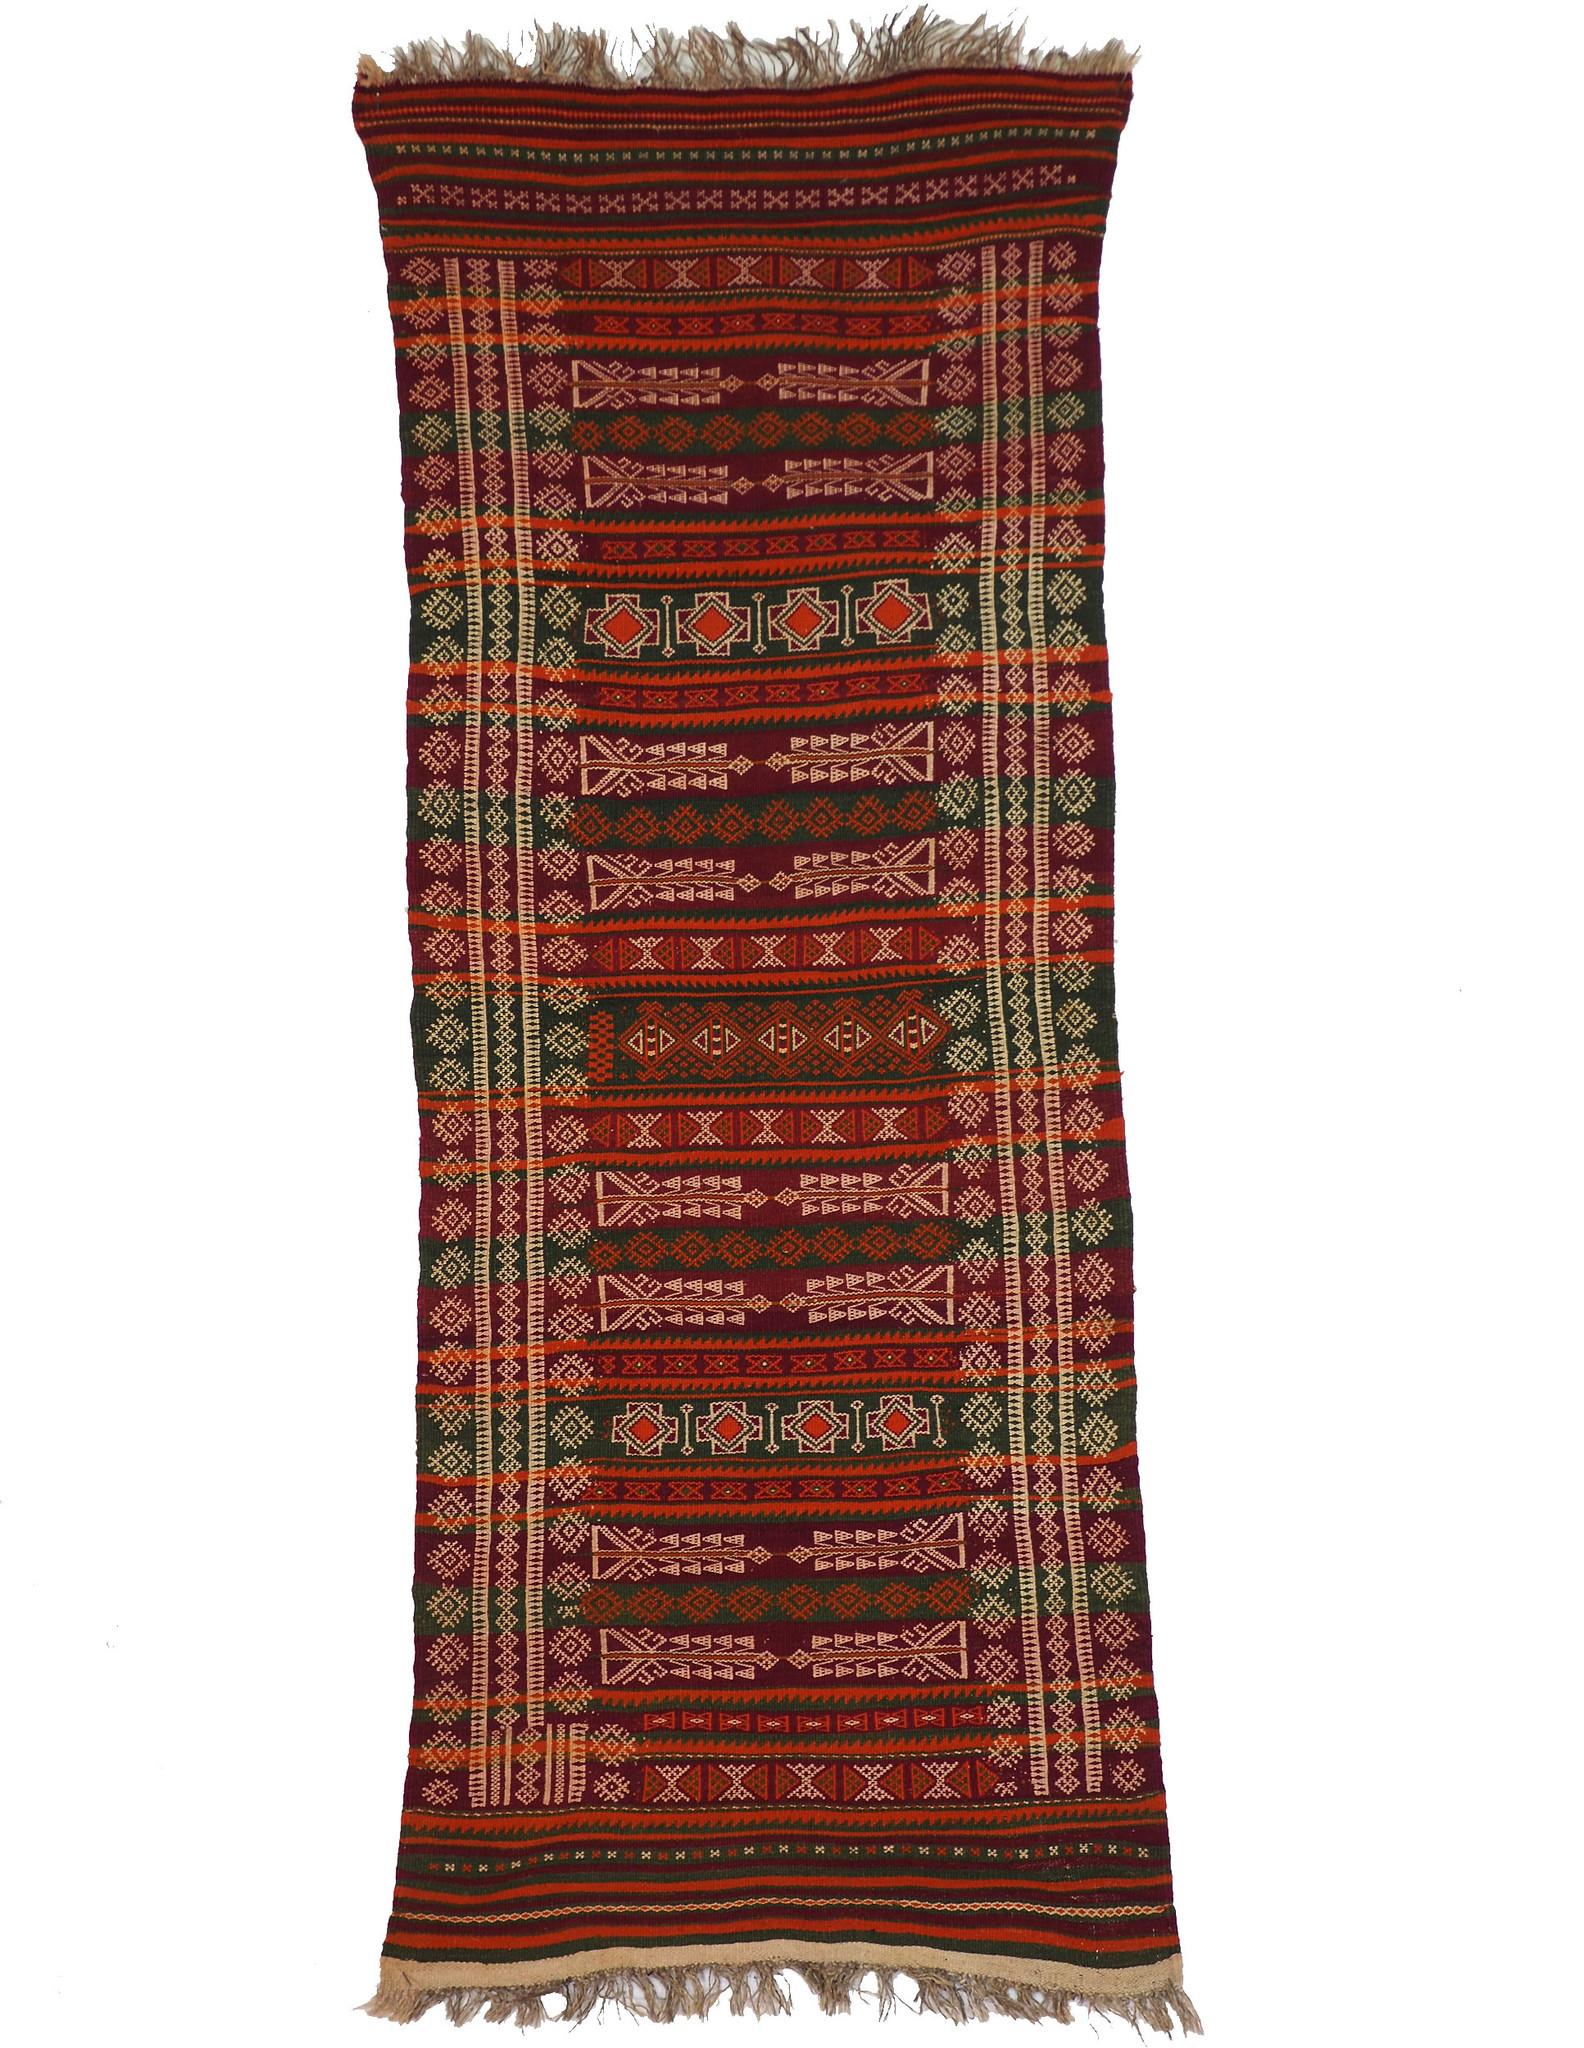 220x93 cm Antik Balouch  kelim afghan Beloch kilim Nr-19/PK-1